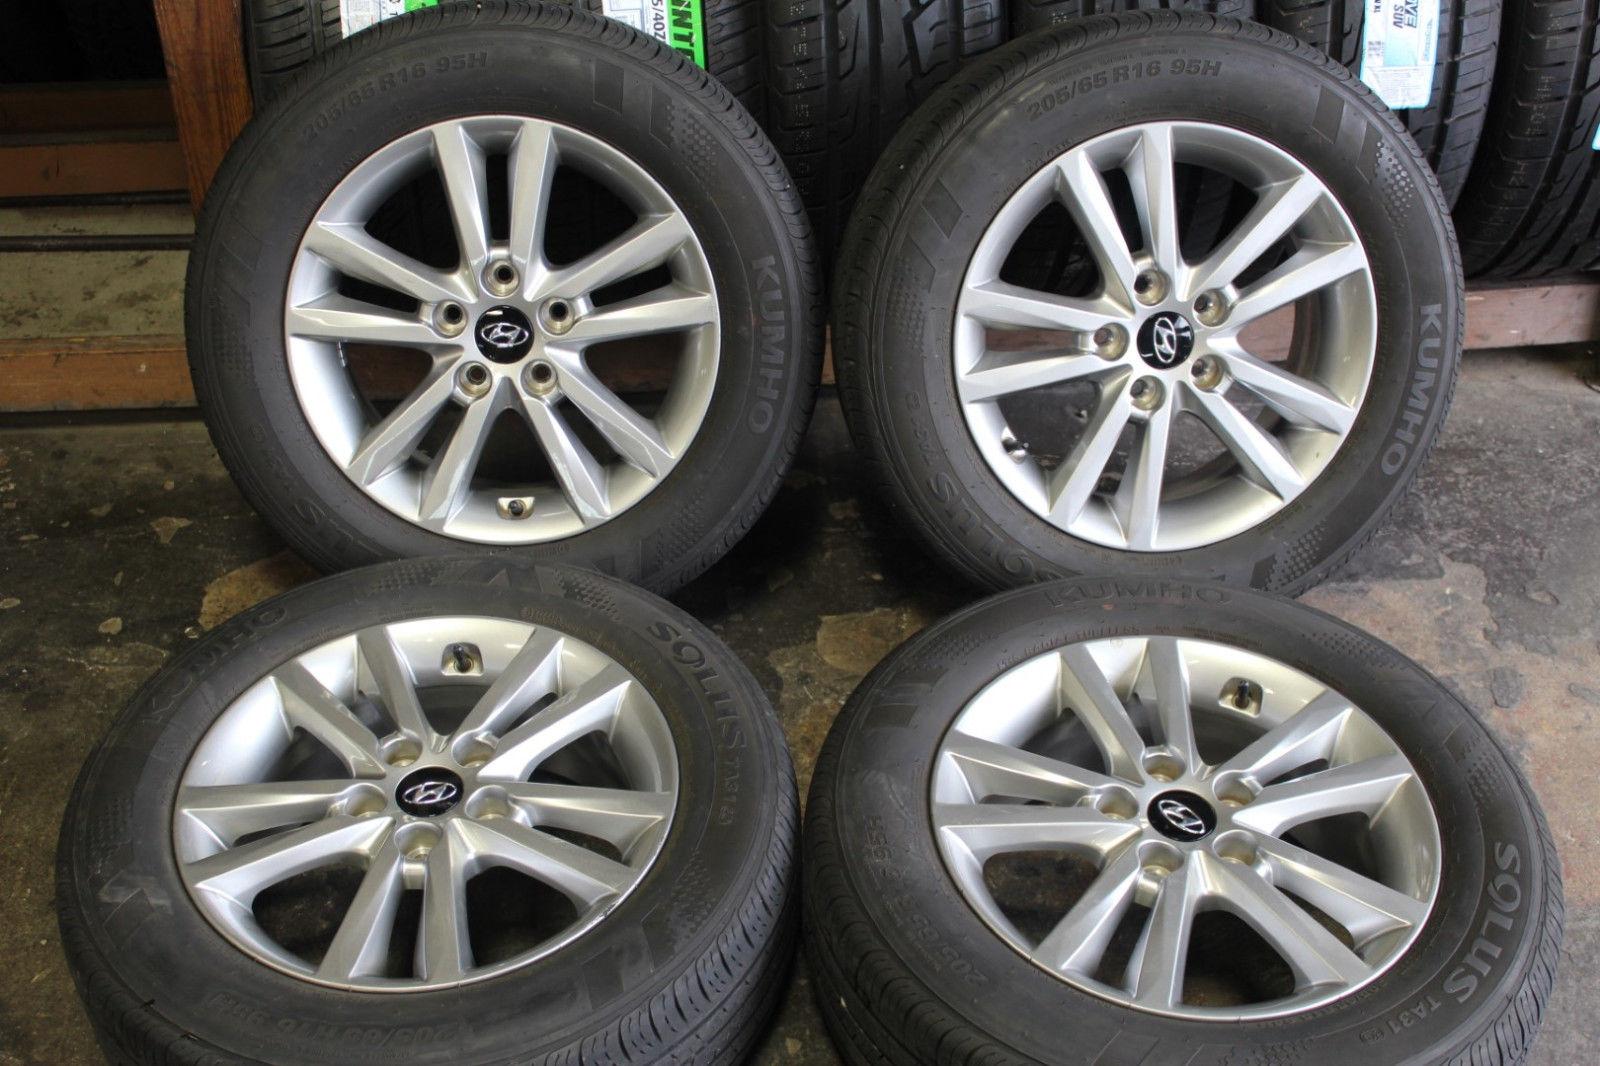 Set Of 4 Hyundai Sonata 2015 2016 16 Oem 205 65r16 95h 70866 Rims Wheels Tires Alloemrims Com